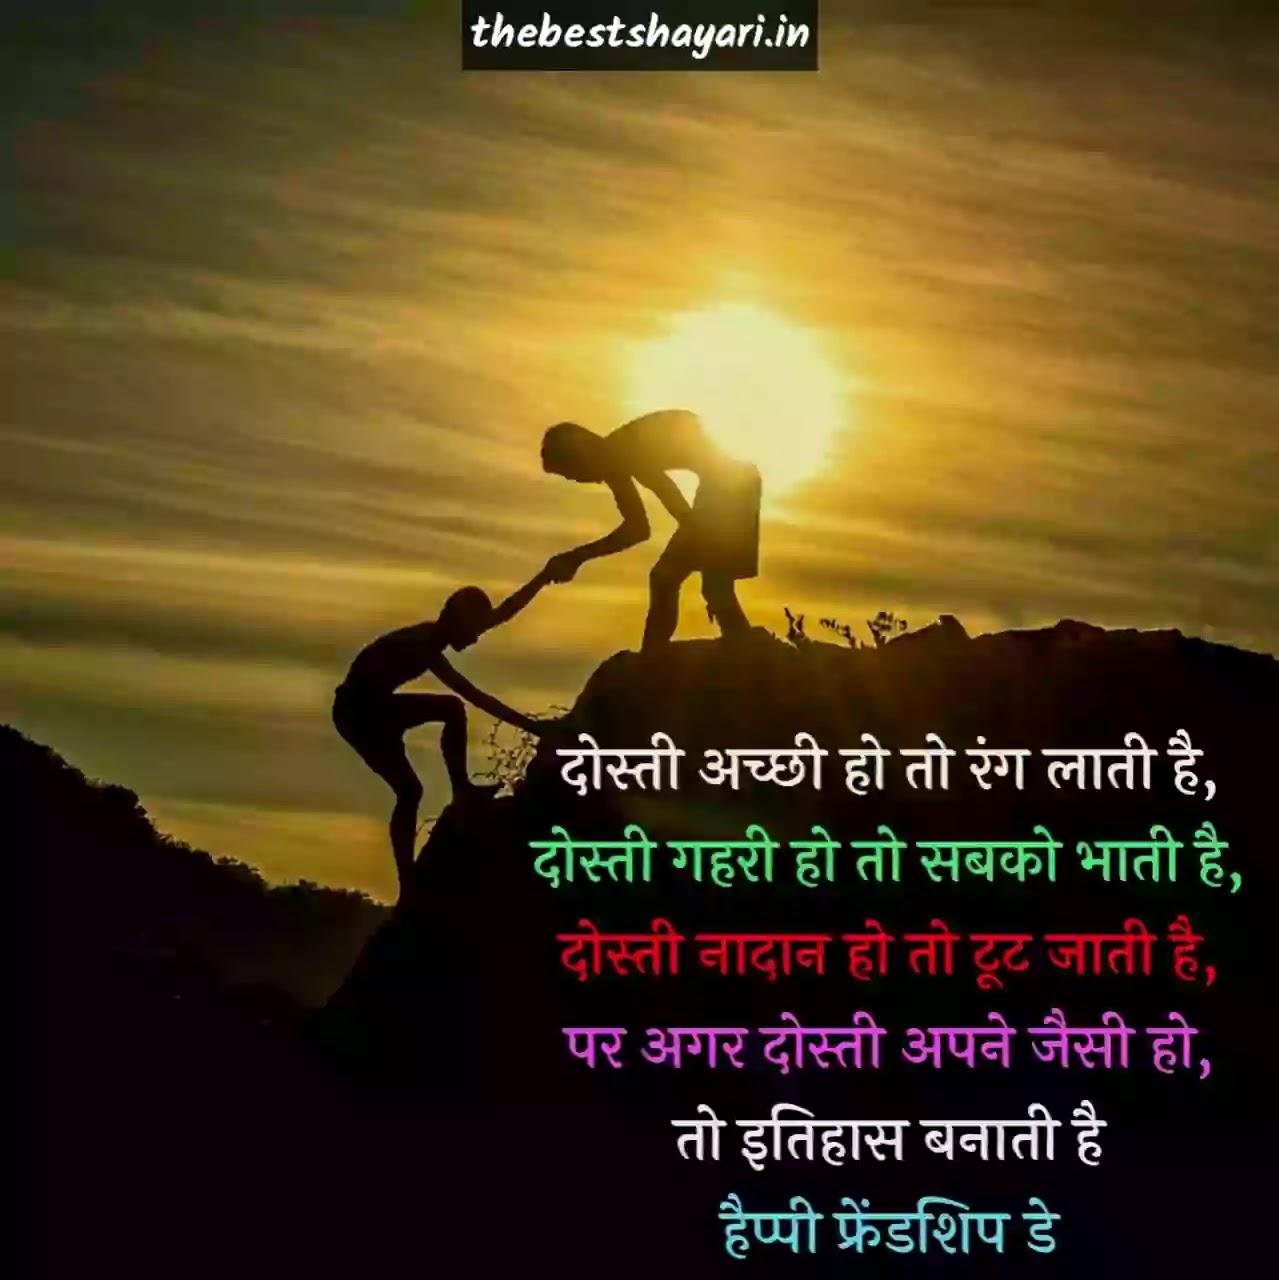 Friendship Day Hindi shayari